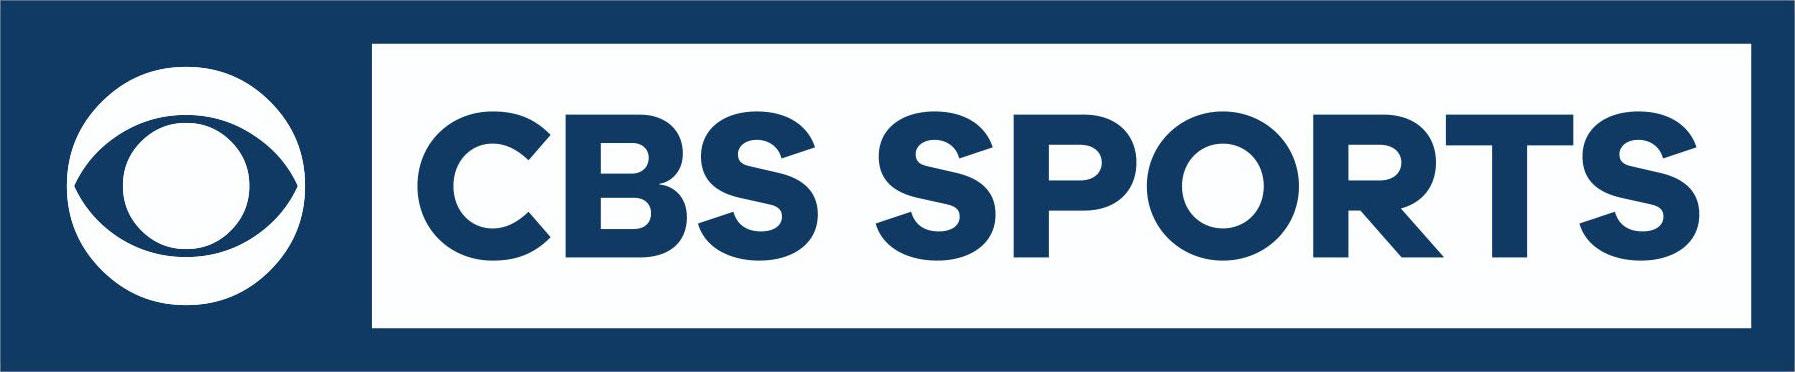 cbssports_logo.jpg